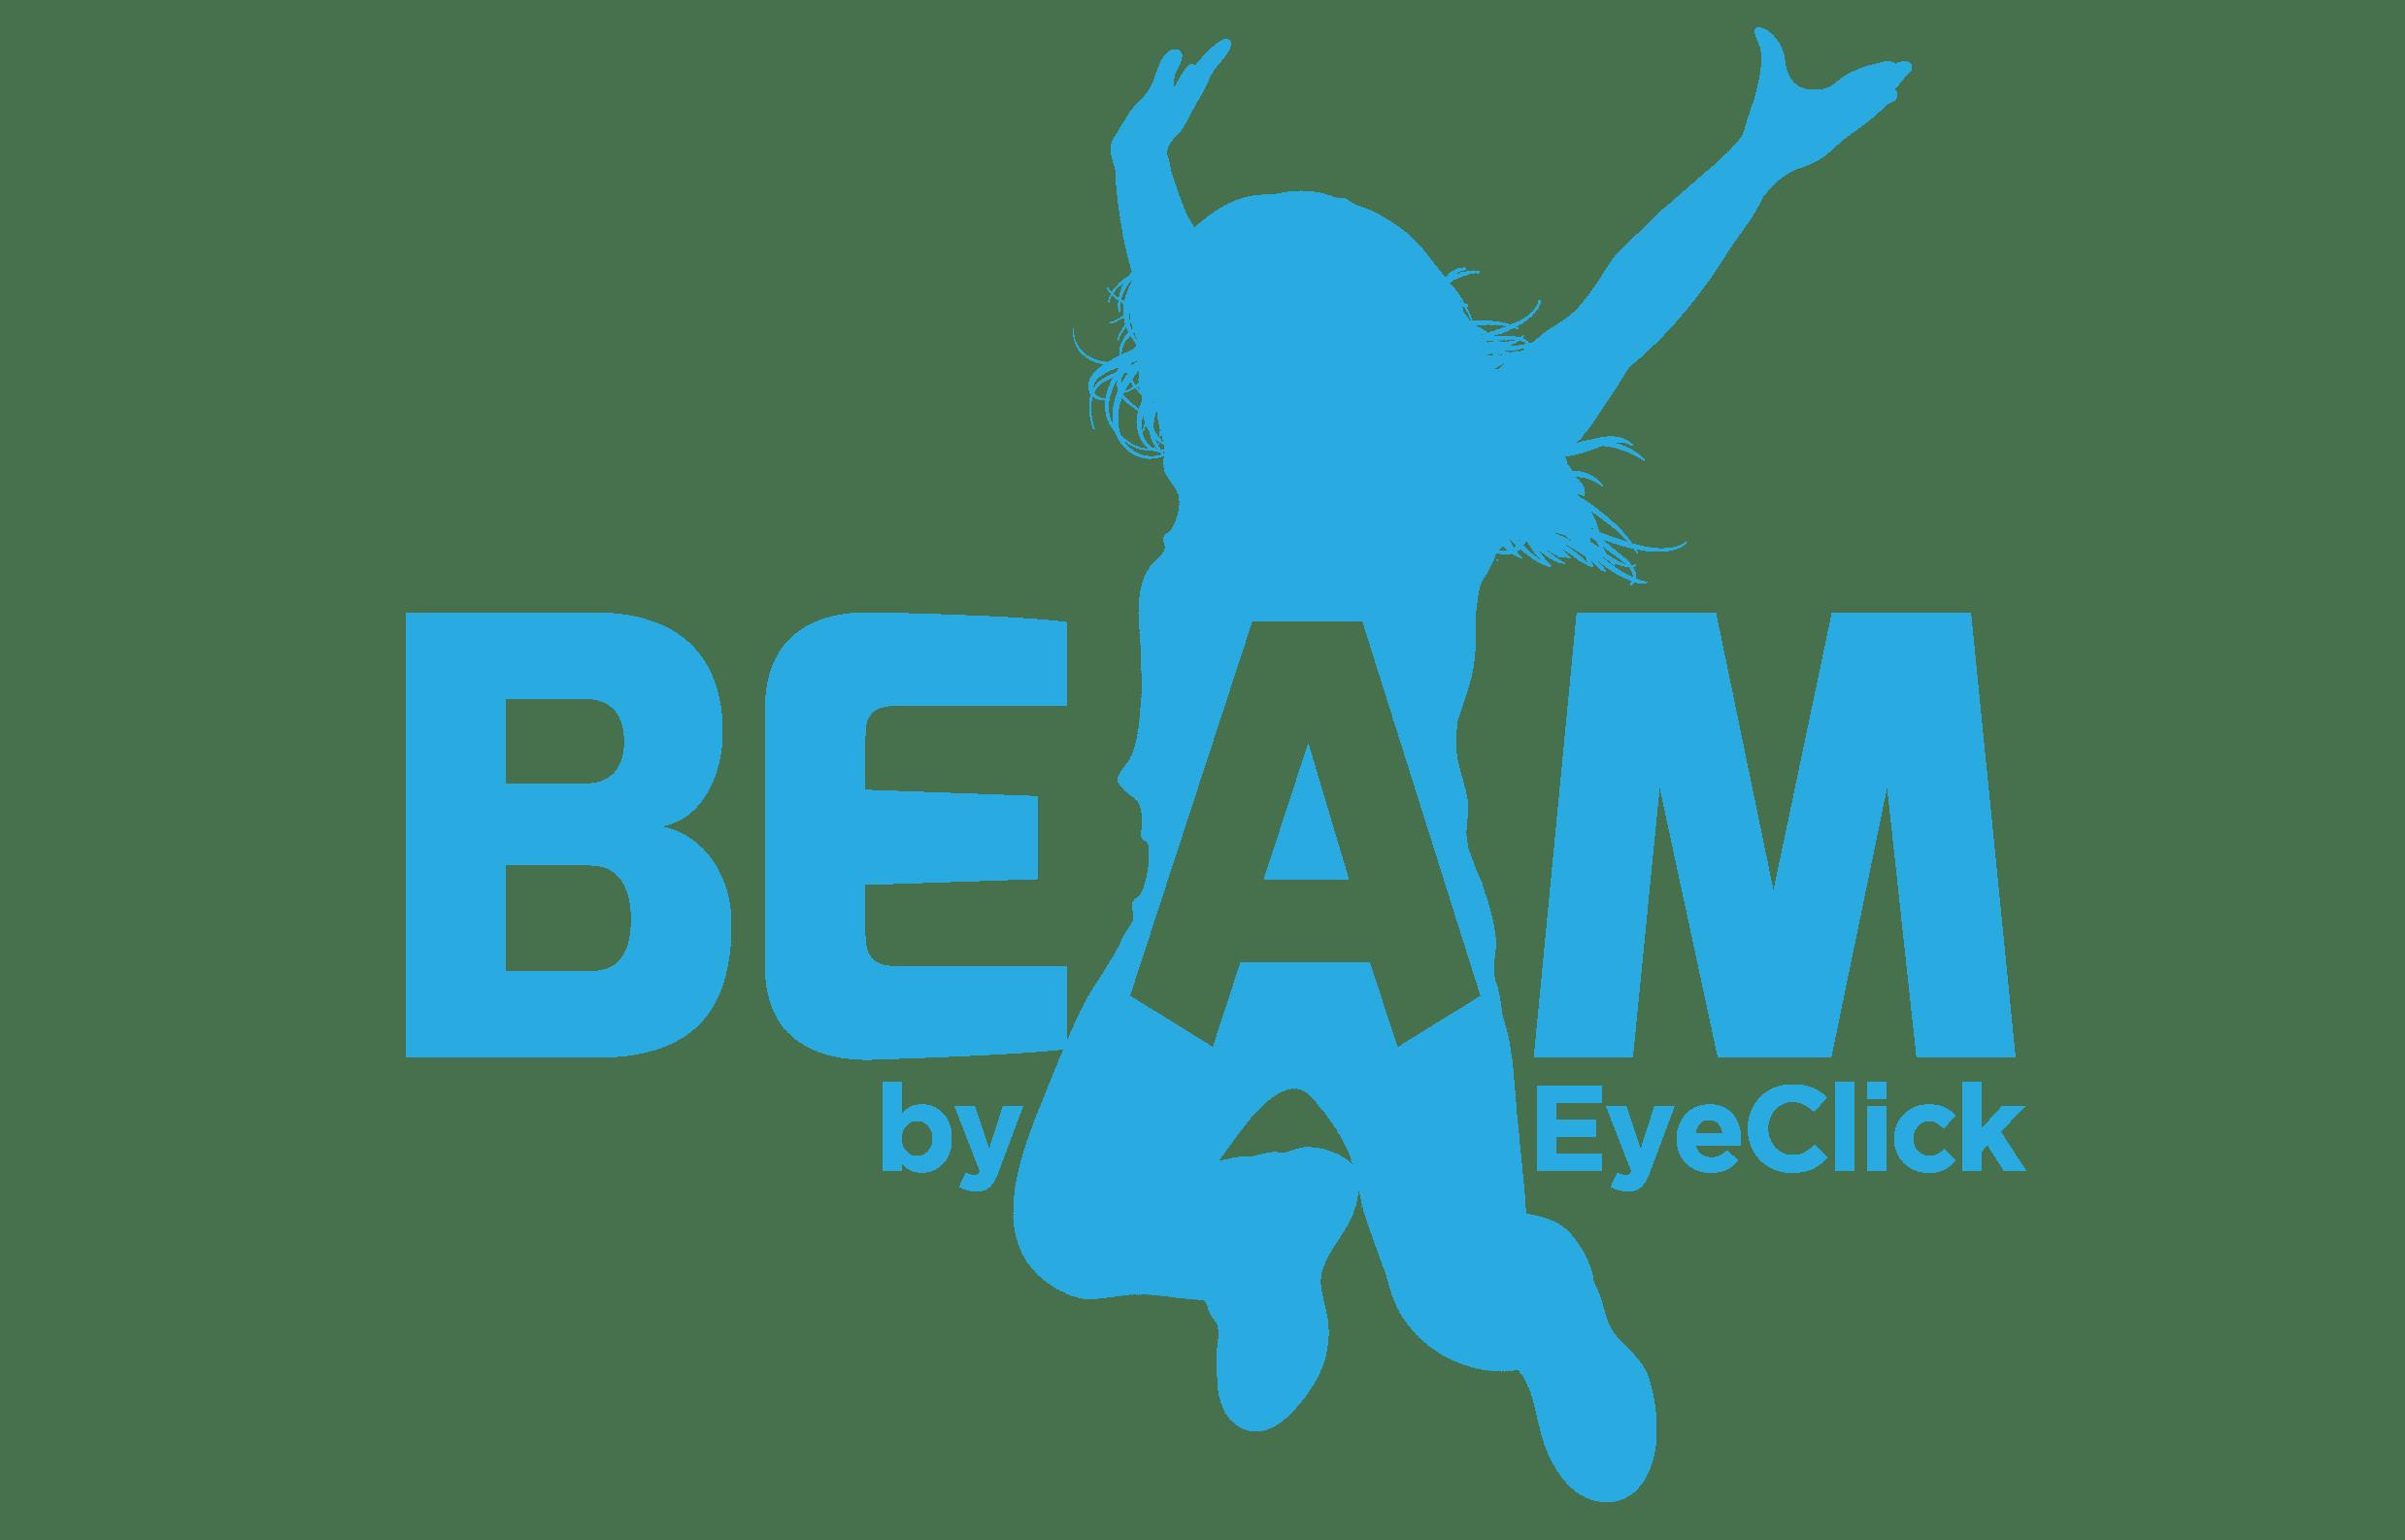 BEAM logo eyeclick